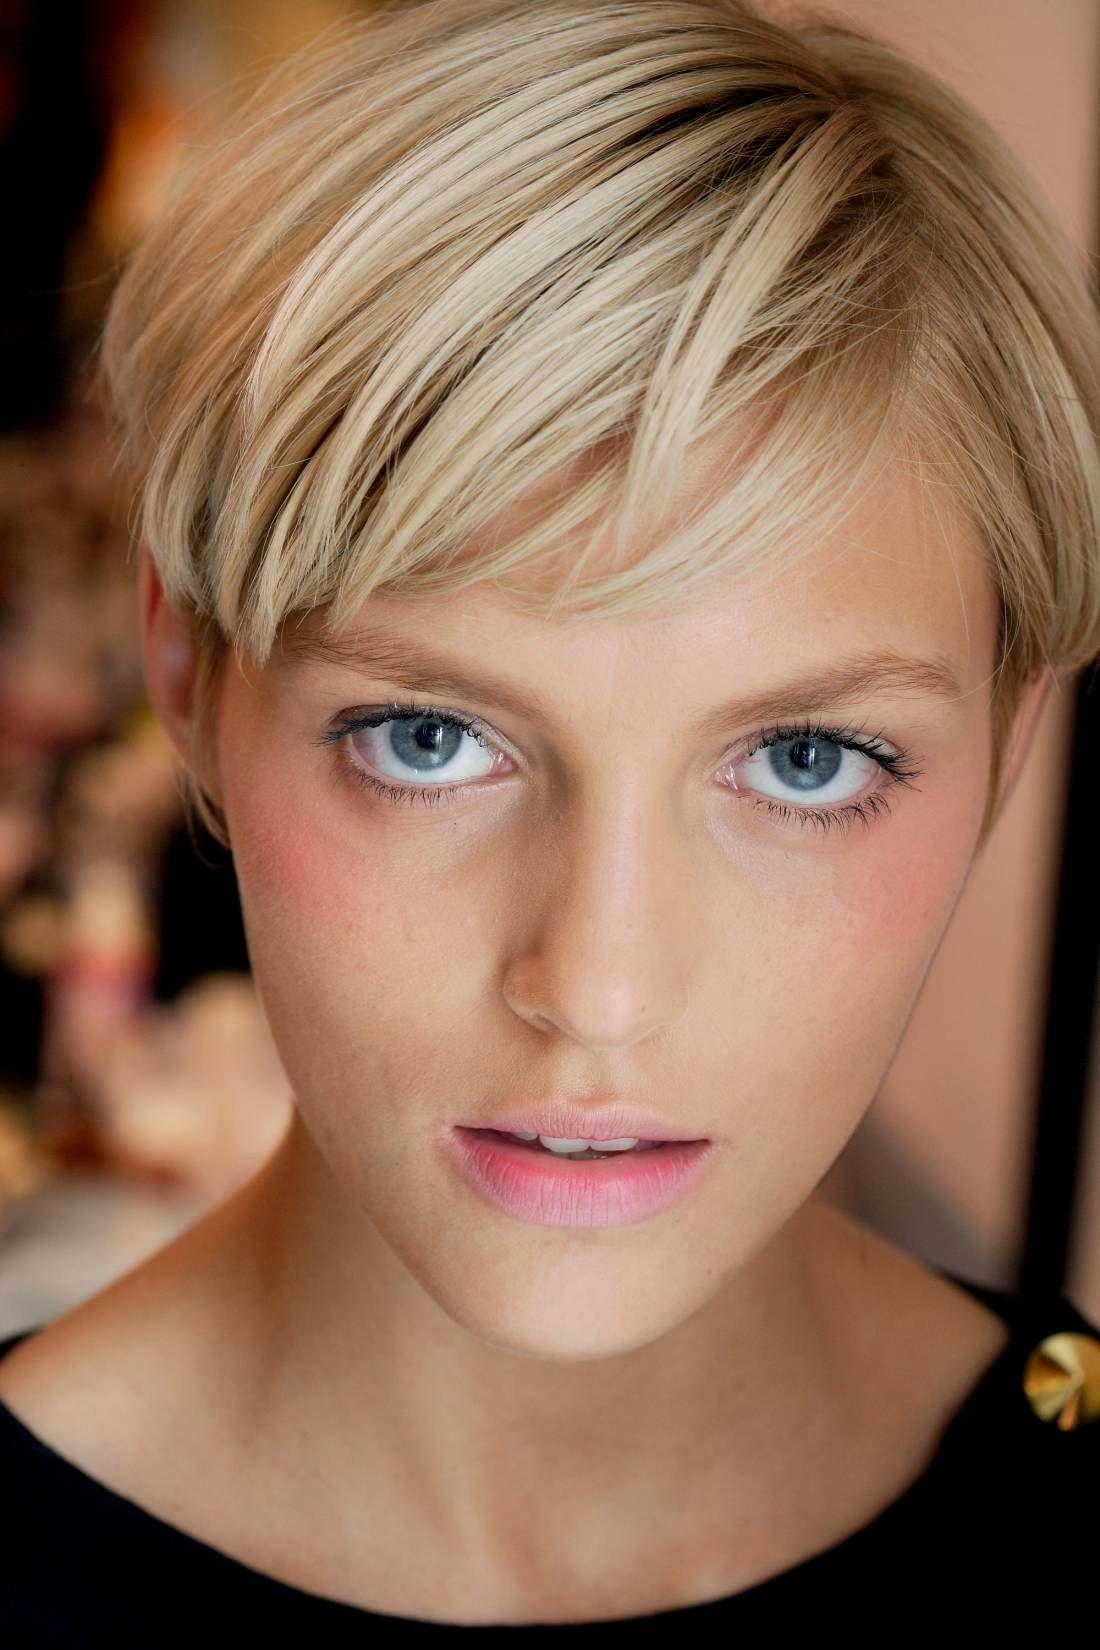 legal corte de cabelo curto foto-Beautiful Corte De Cabelo Curto Imagem